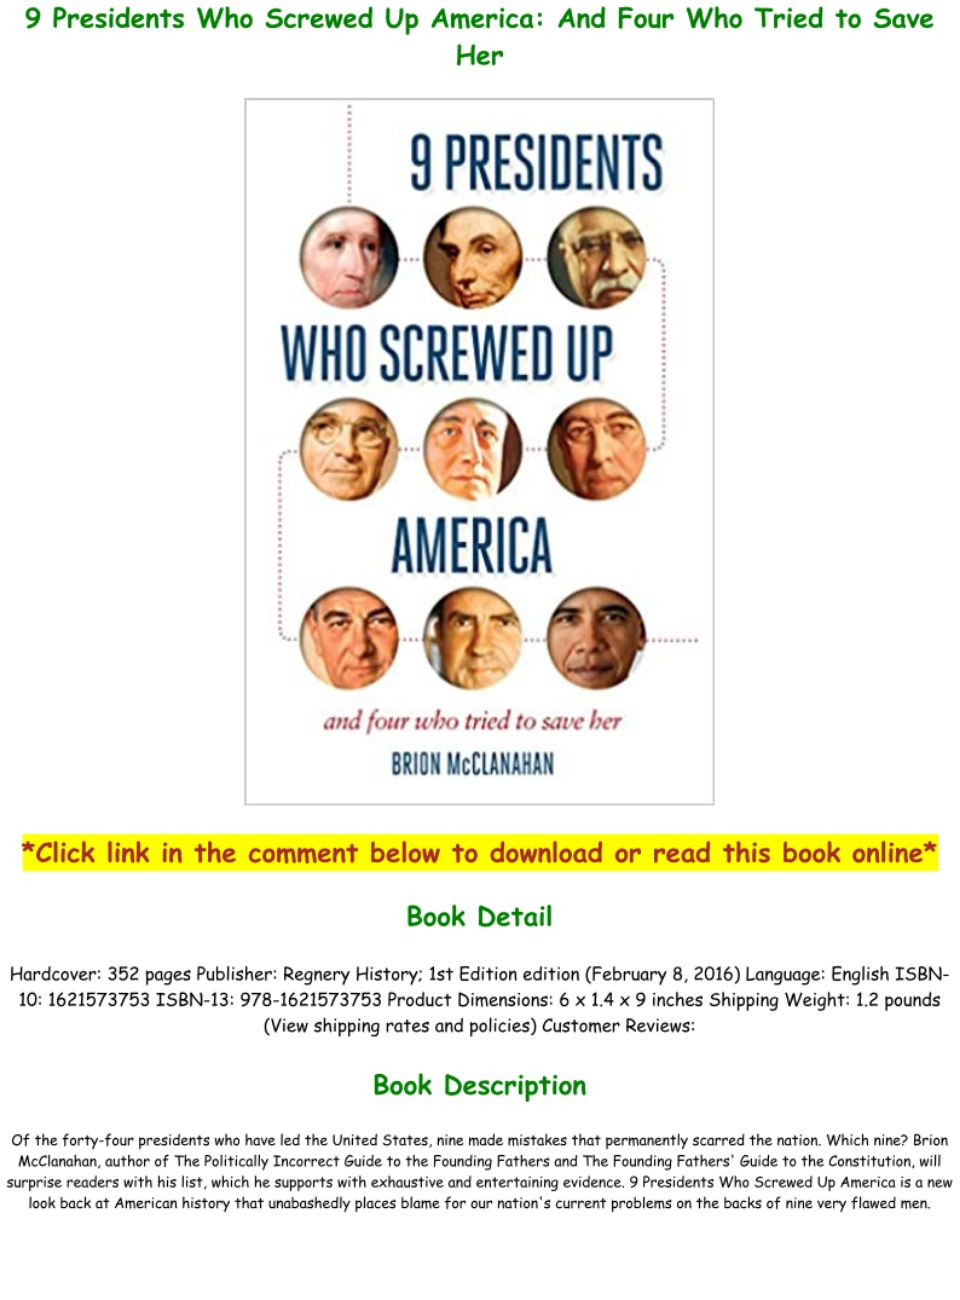 9 Presidents Who Screwed Up America Pdf